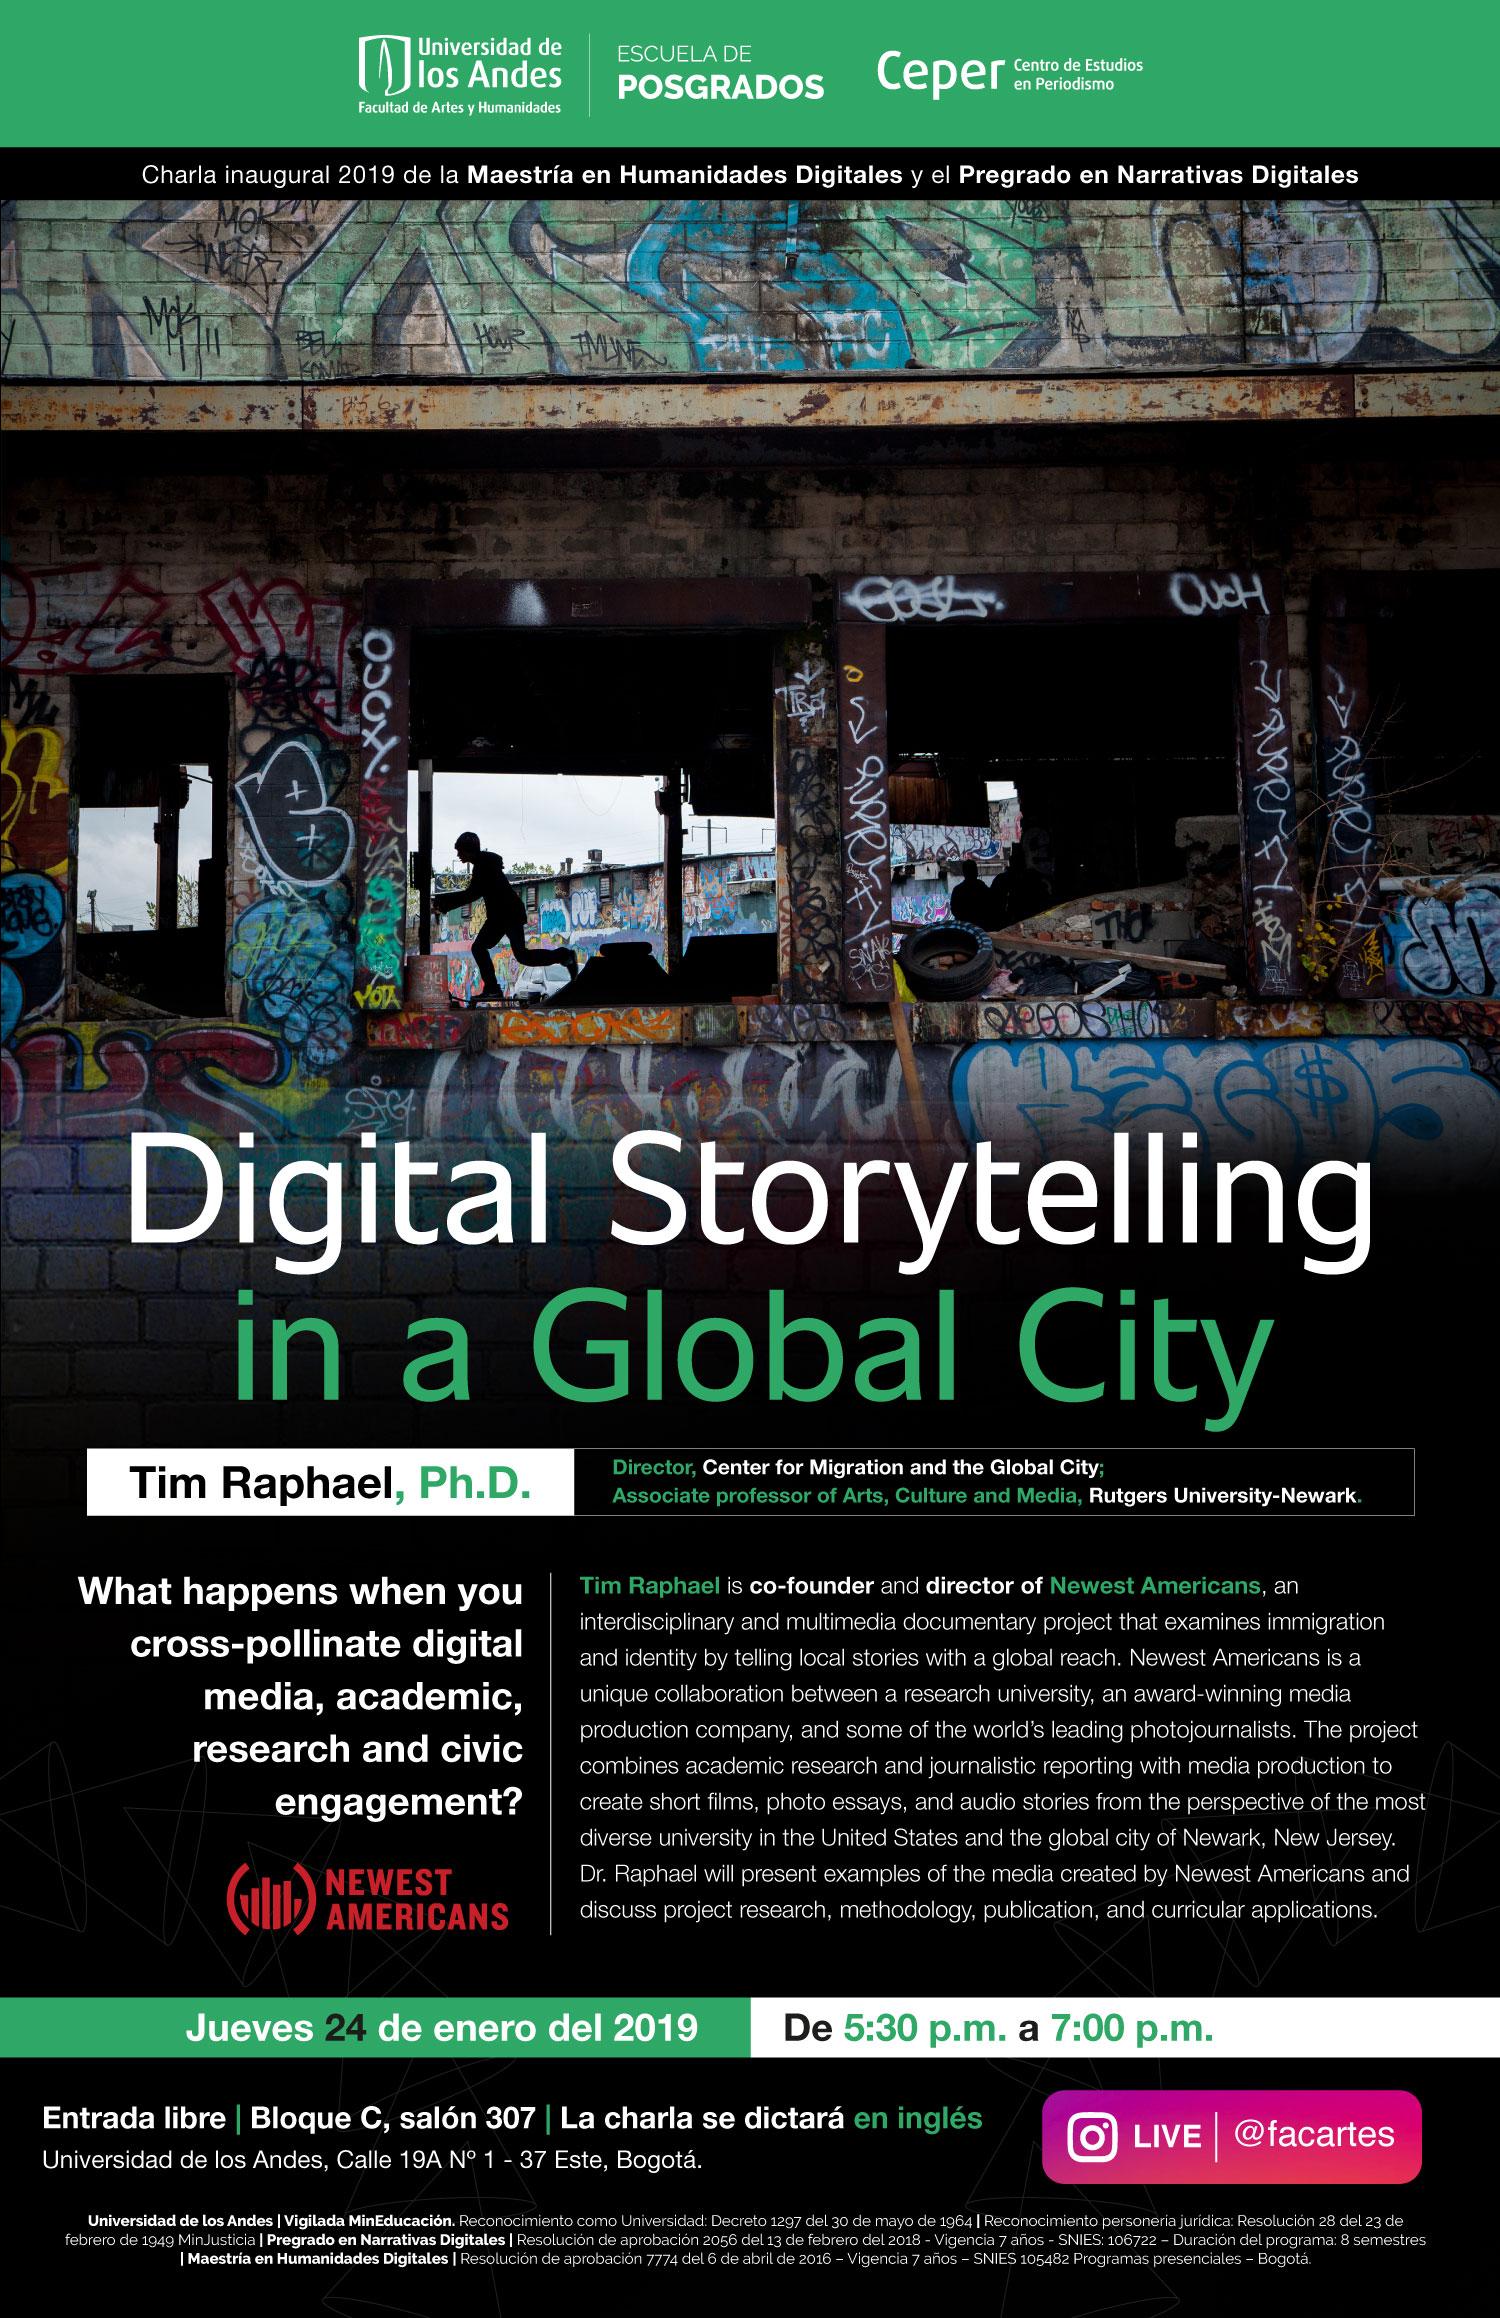 Charla inaugural 2019 – Digital Storytelling in a global city